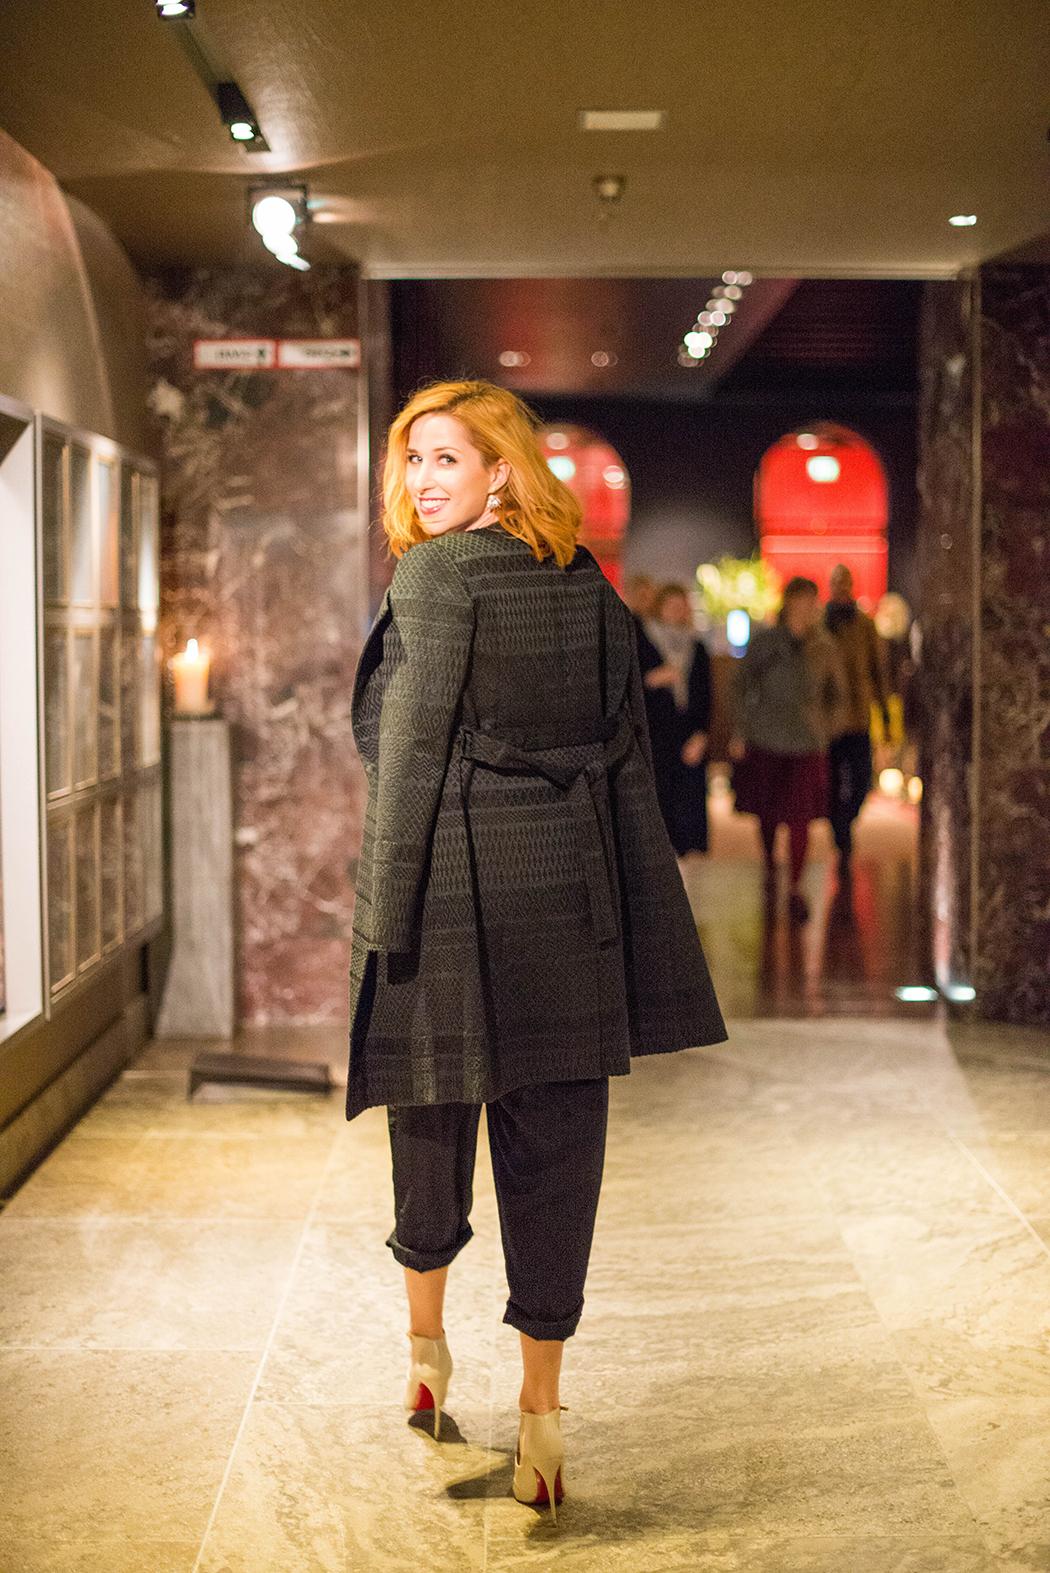 Fashionblog-Fashionblogger-Fashion-Blog-Blogger-Lifestyle-Lindarella-Marcel-Ostertag-Fashionshow-16-web